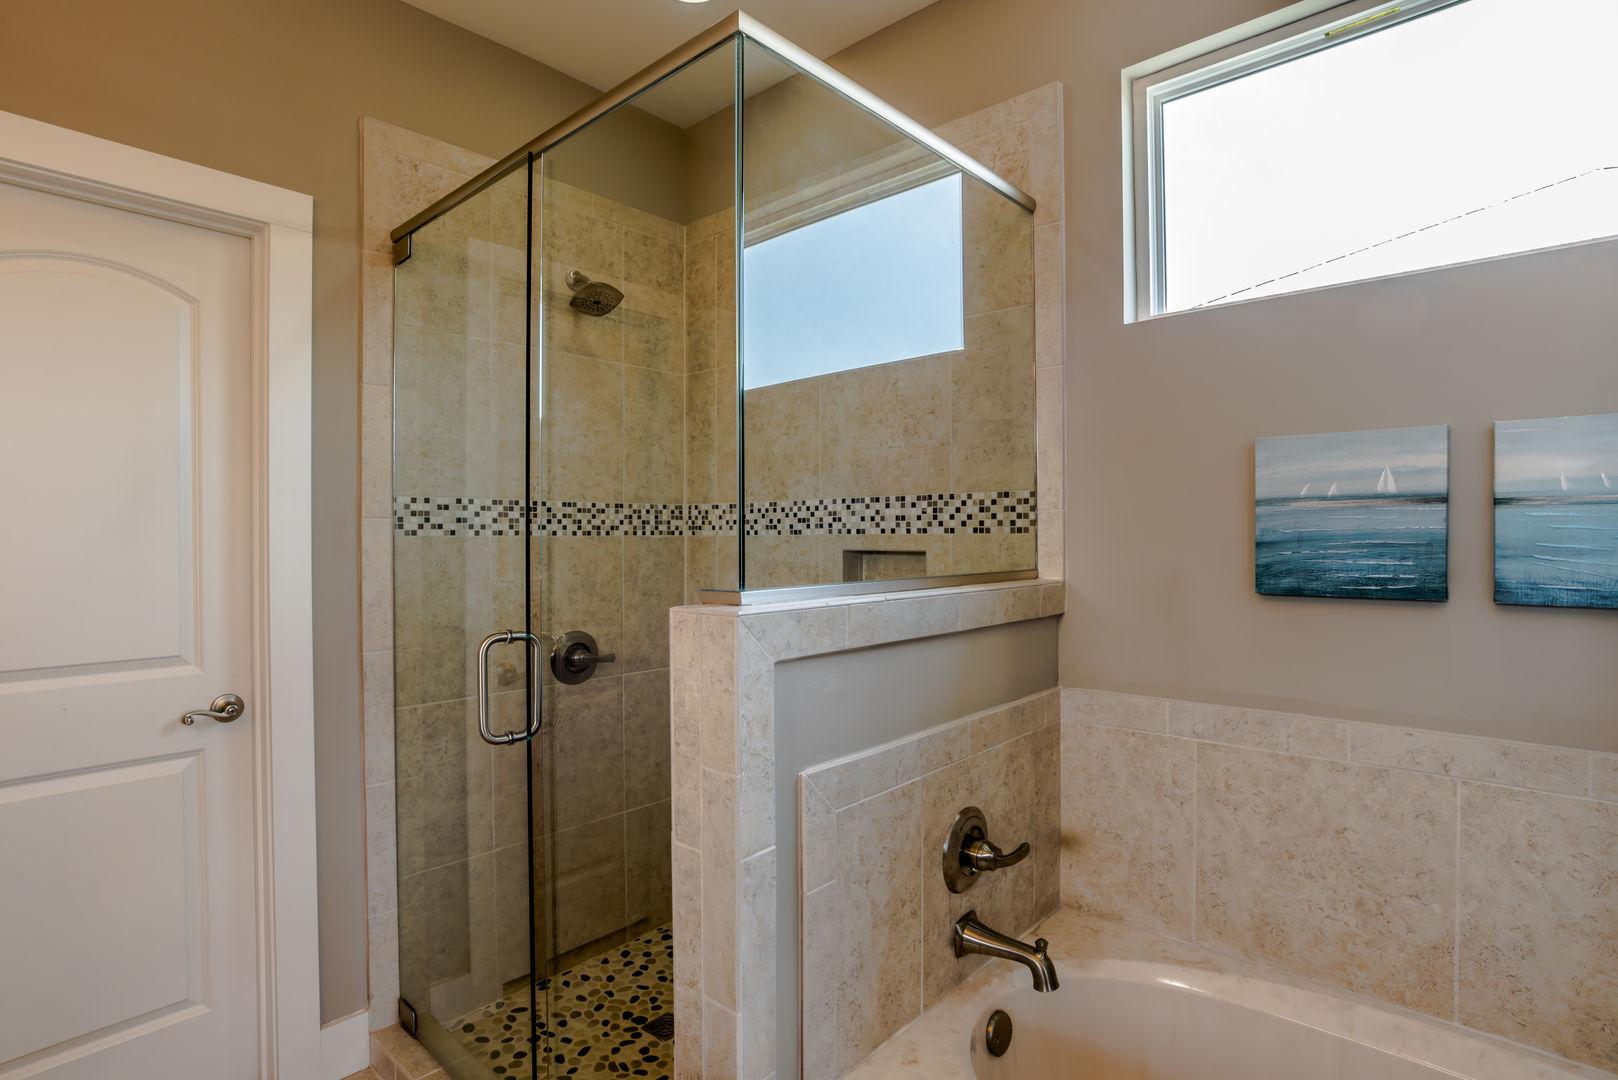 Master Bathroom Has a Separate Shower & Tub